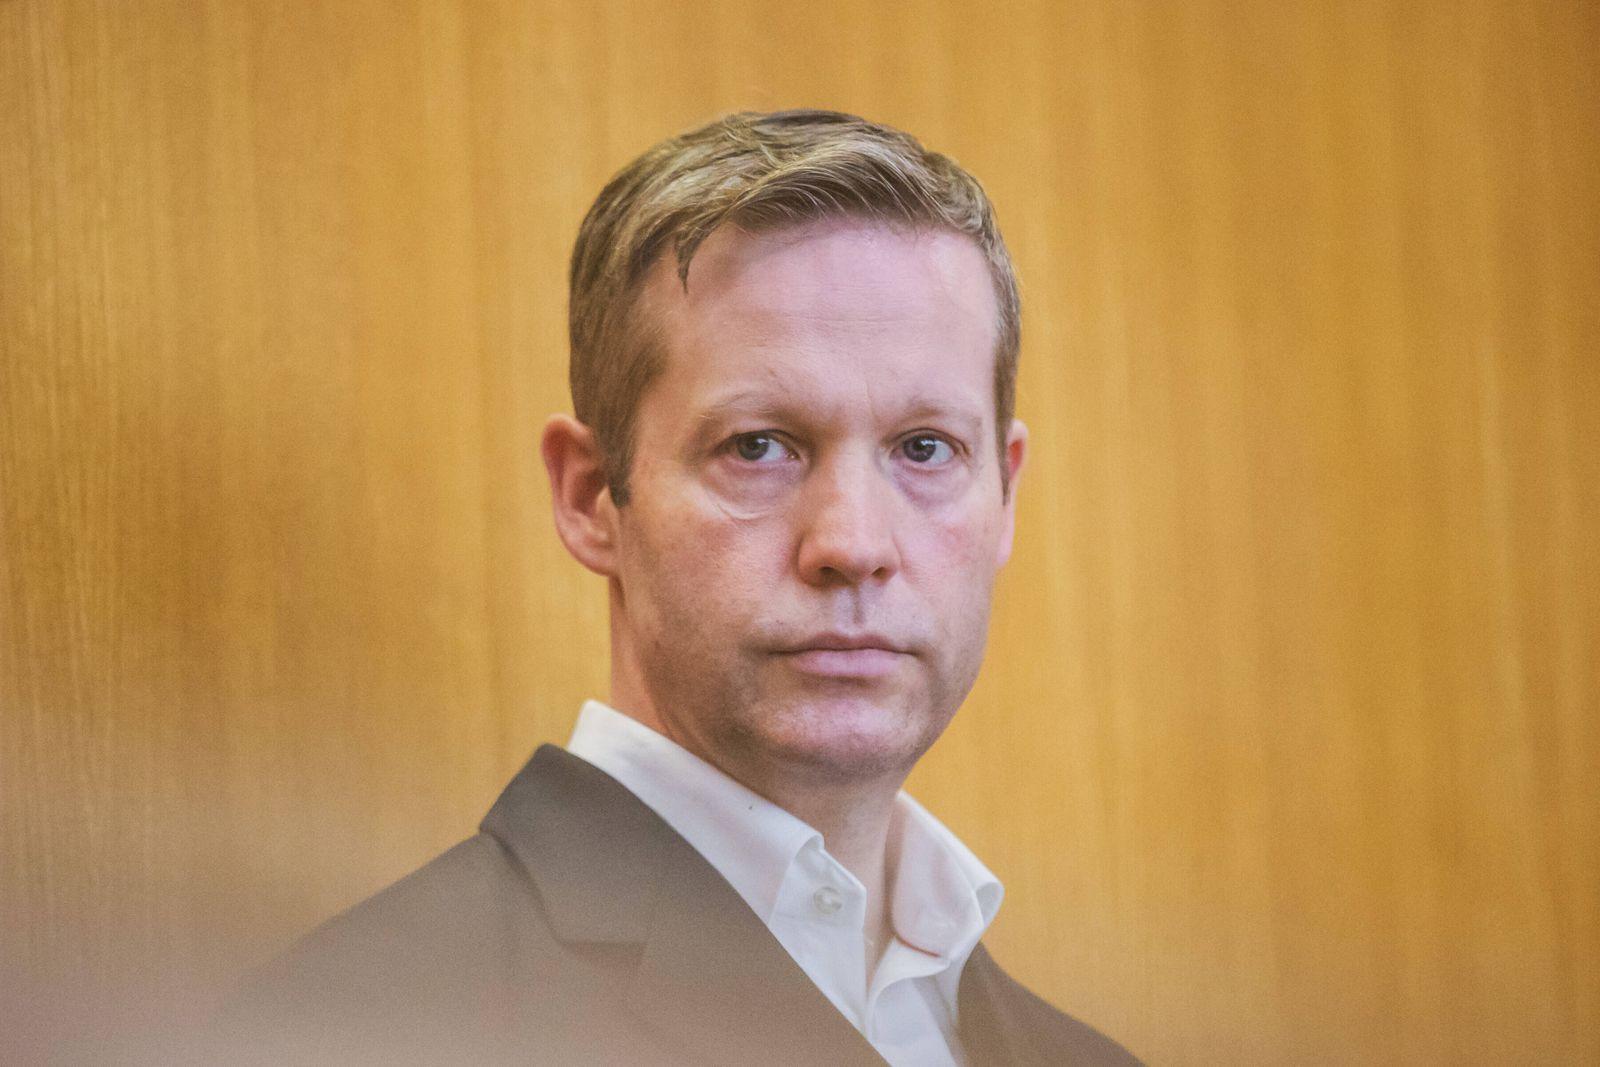 18.06.2020, xblx, deloka, emonline, delahe, Prozess: Tod von Dr. Walter Luebcke (Walter Lübcke), Angeklagter Stephan Er